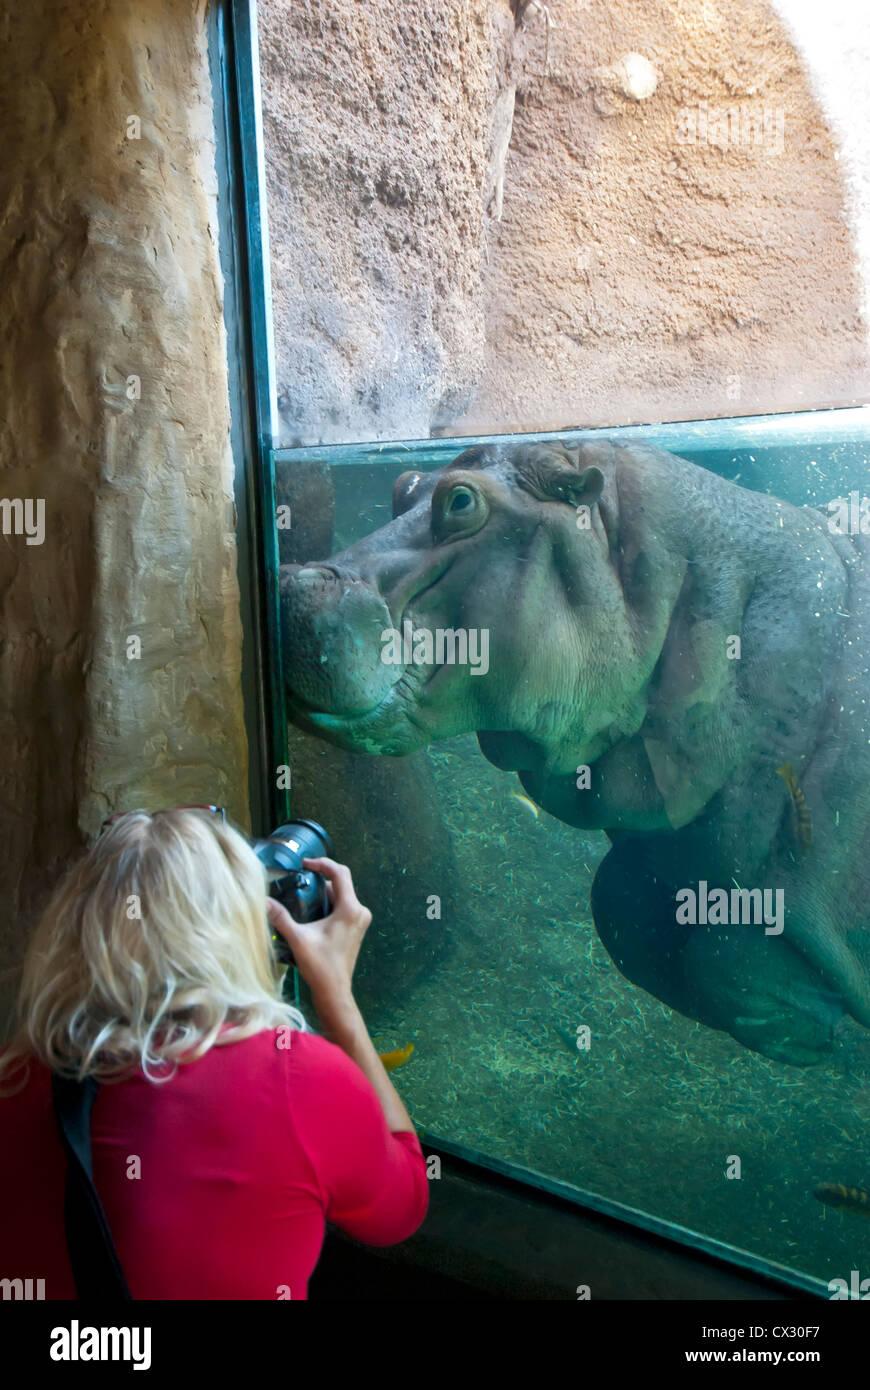 Wowman Takes Photo pf  hippopotamus underwater - Stock Image